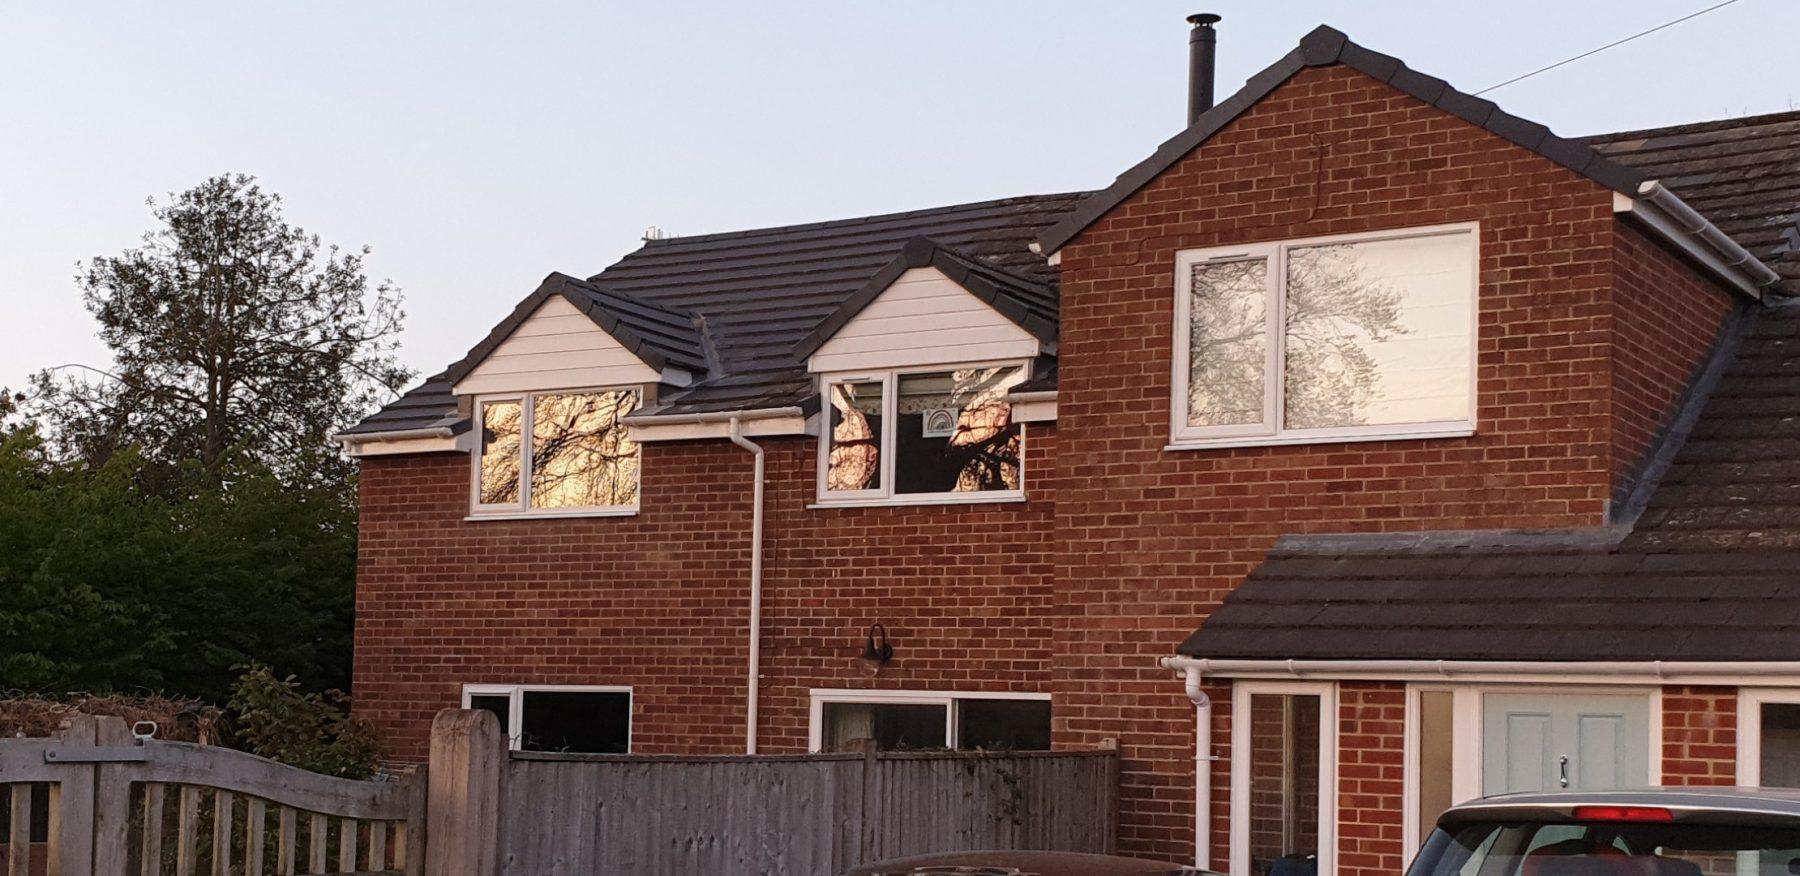 Two storey extension in Marlborough Wiltshire